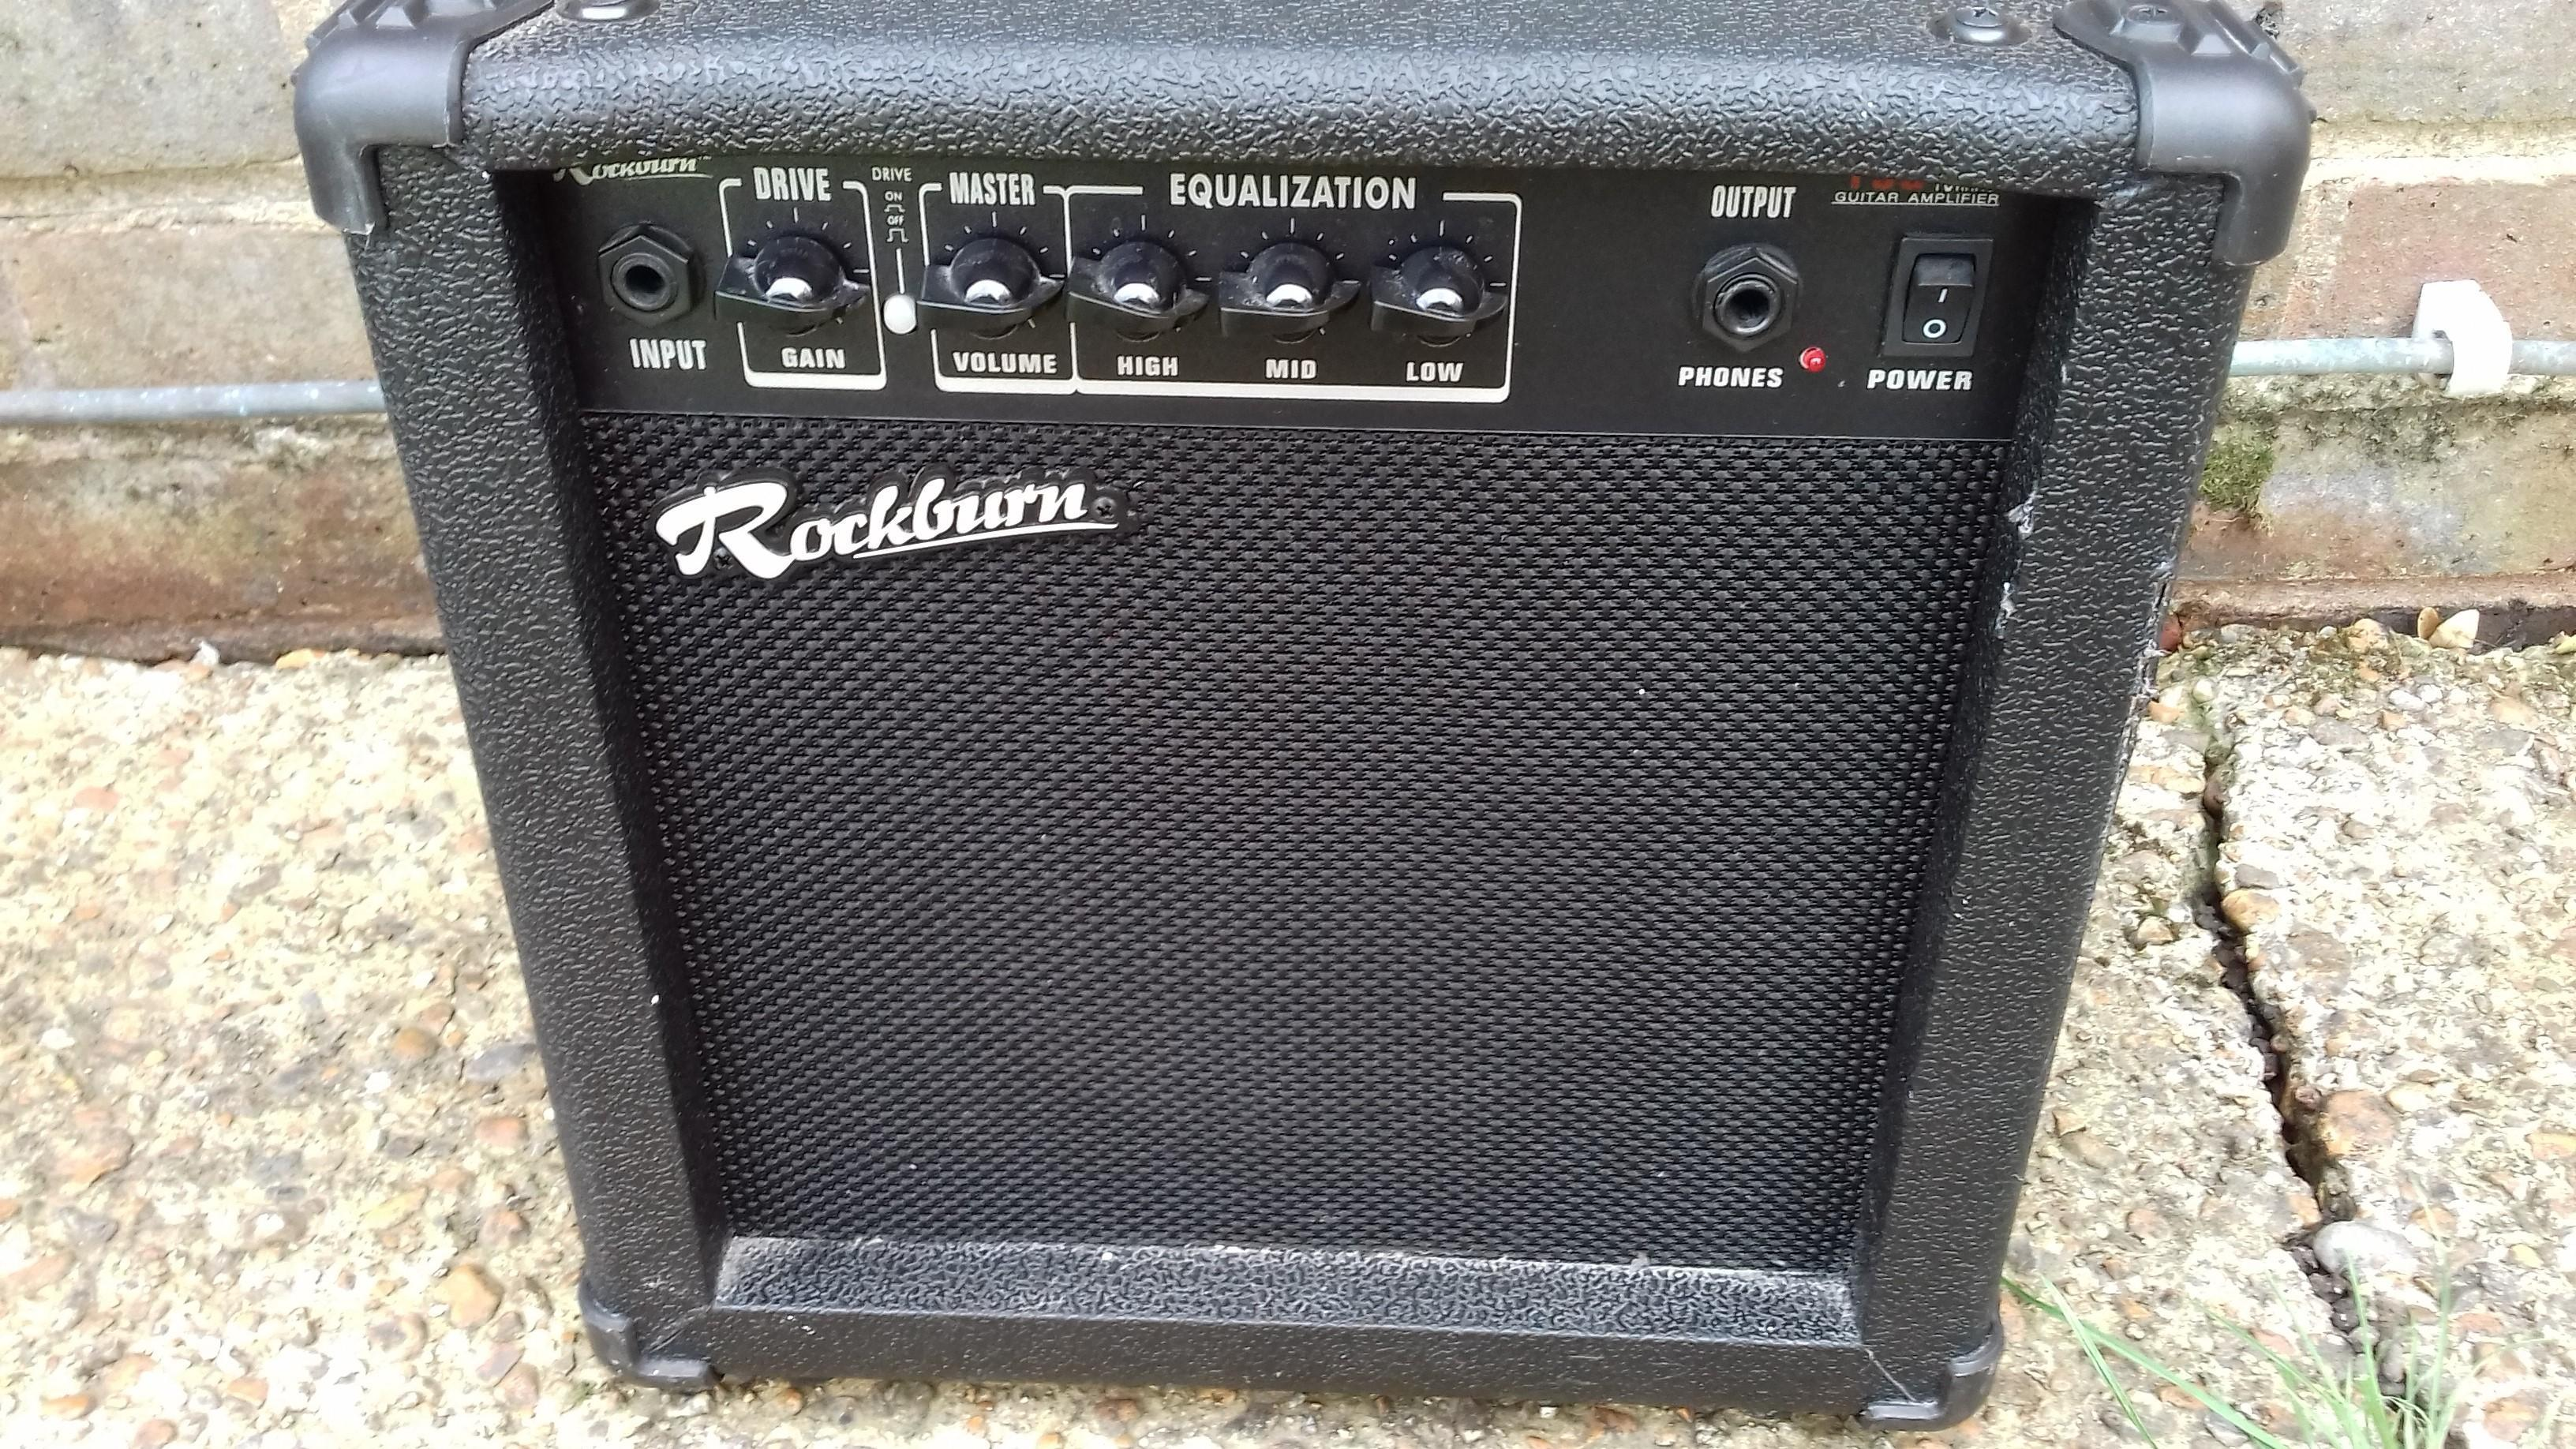 Guitar Practice Amp 15watt Rockburn Fully Working In